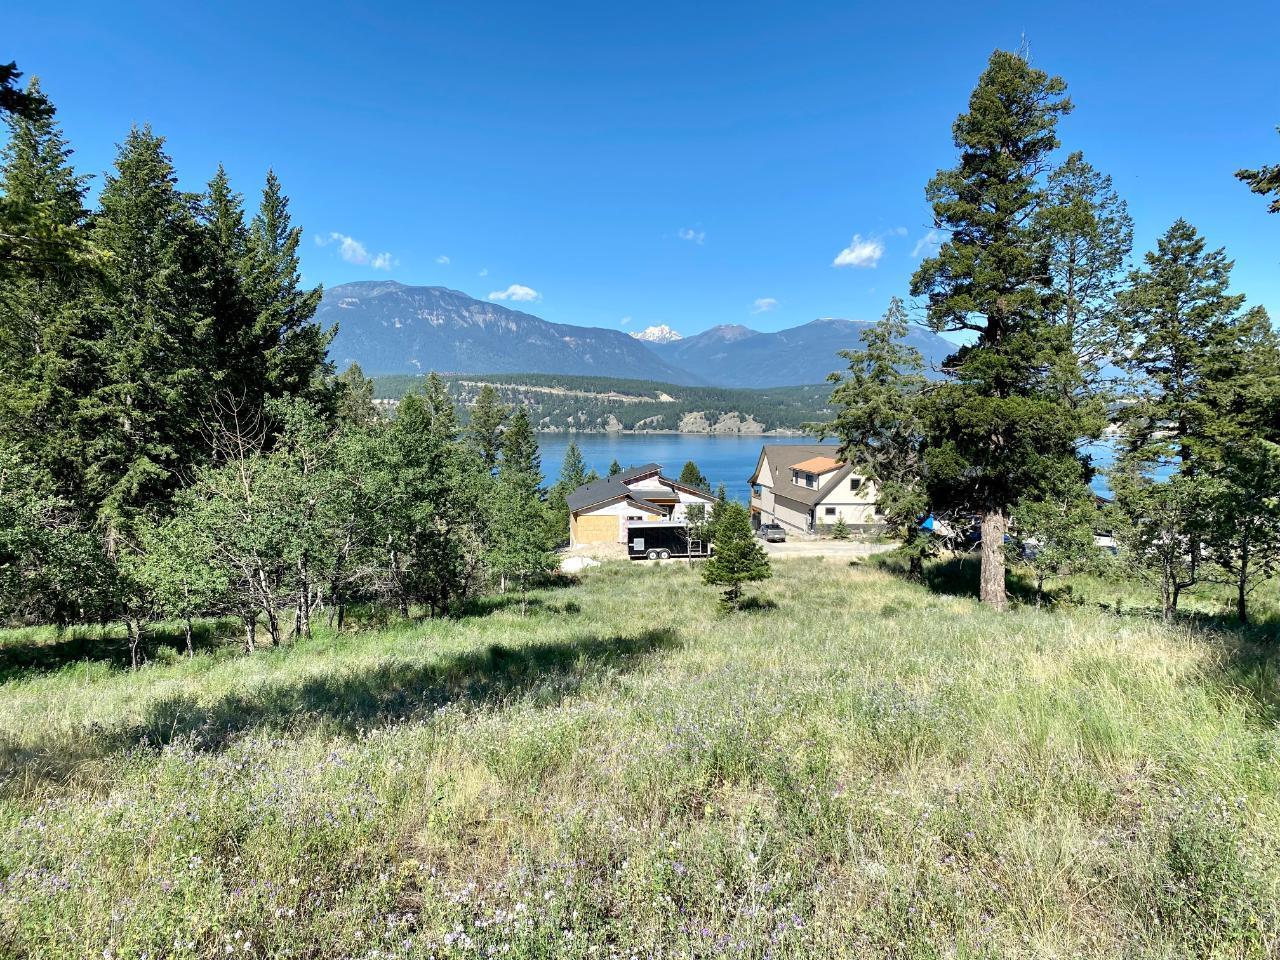 Lot 7 Stoddart Estates Drive, Windermere, British Columbia  V0B 2L0 - Photo 1 - 2451190